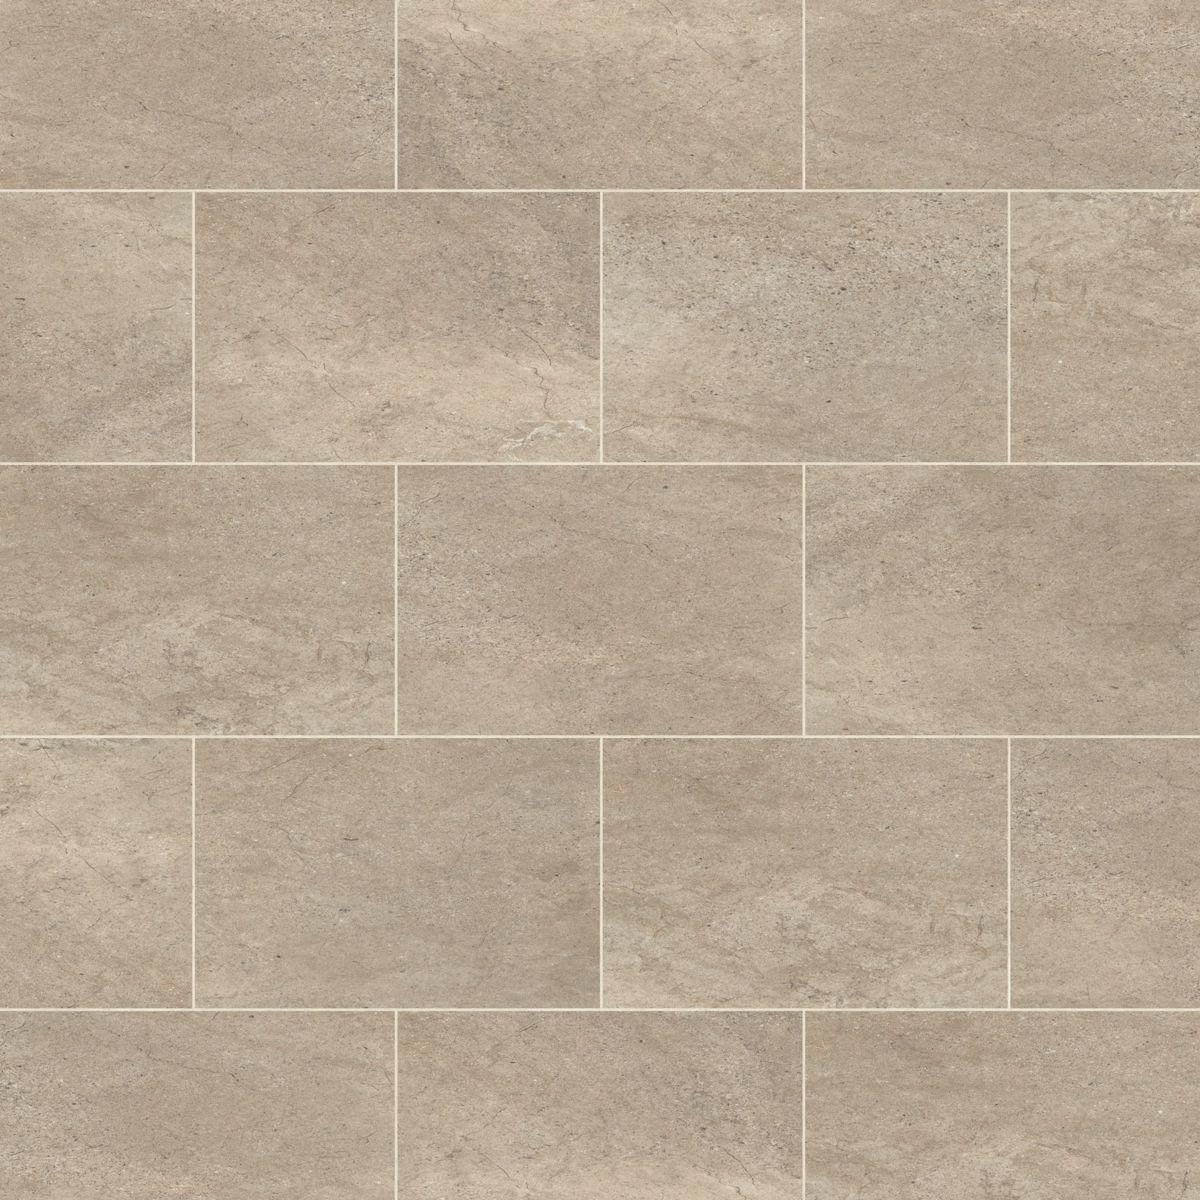 Stone Tile Flooring : Karndean knight tile portland stone st vinyl flooring